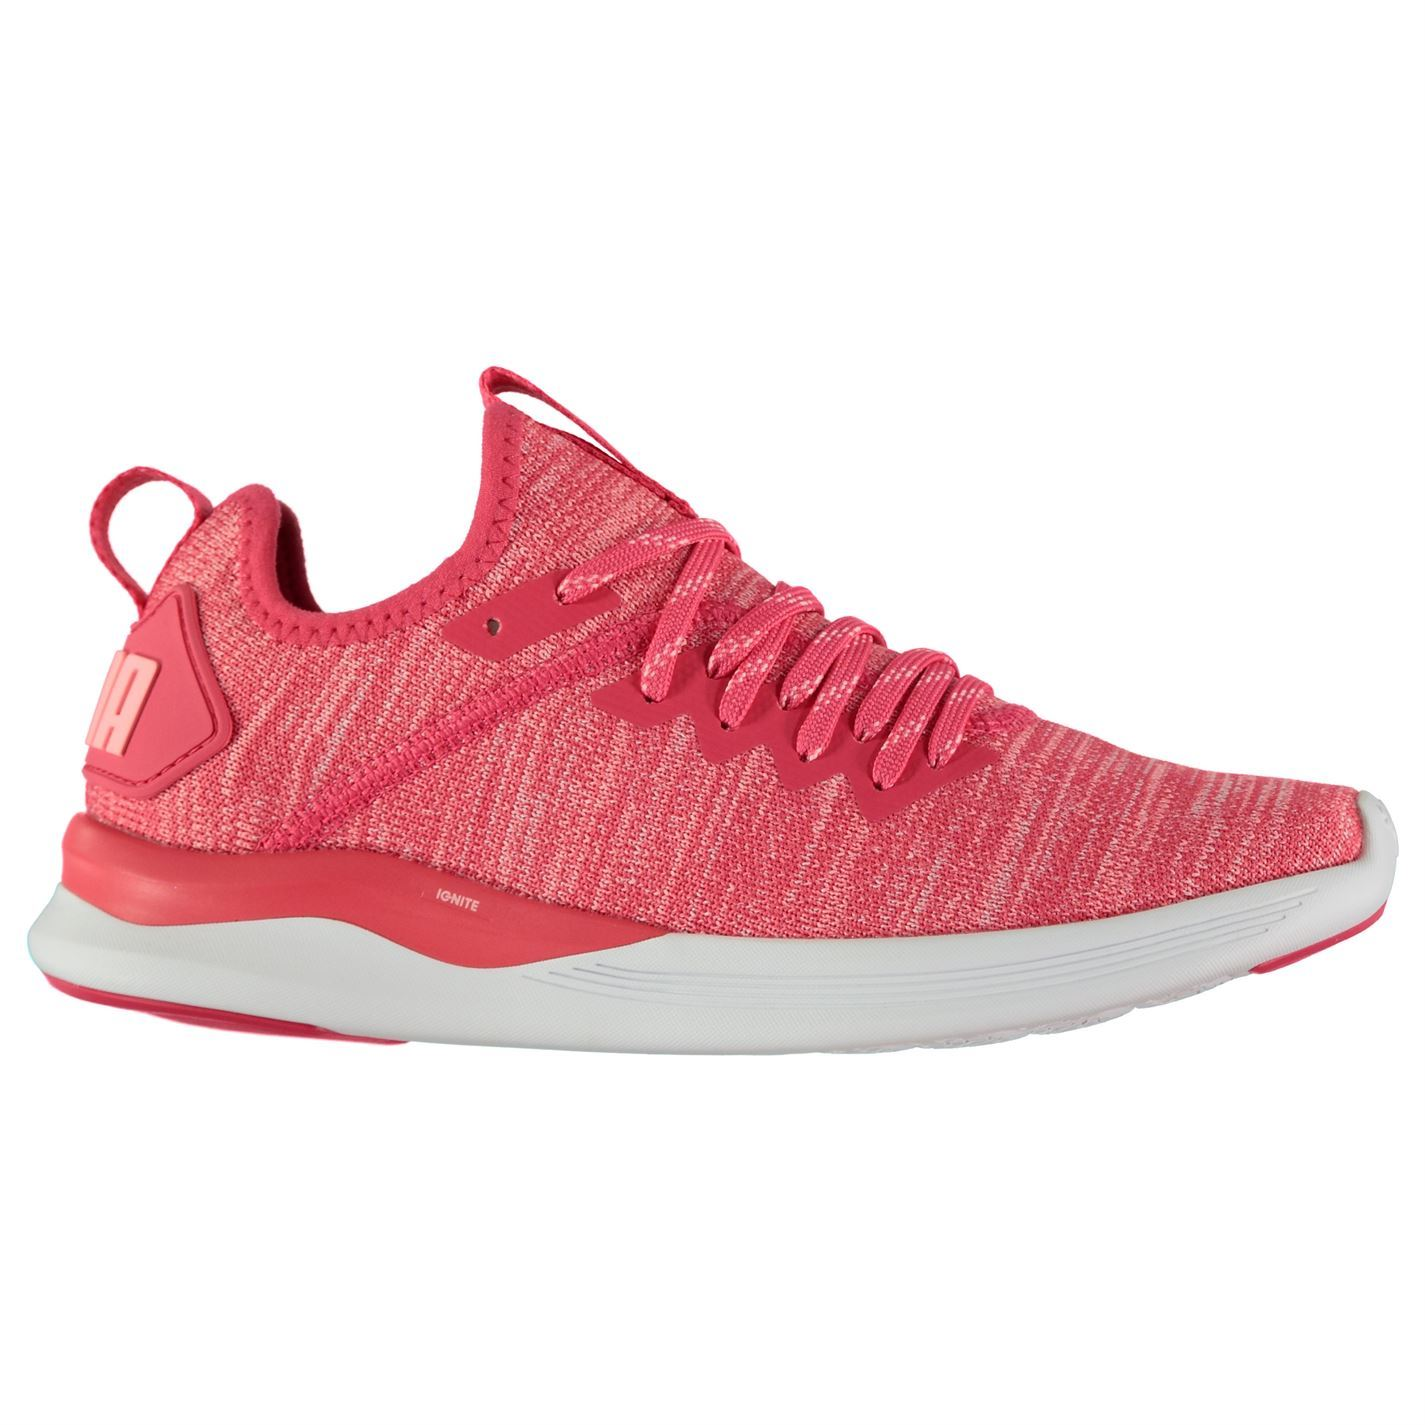 Puma Ignite Flash Fitness Training Shoes Womens Pink Gym